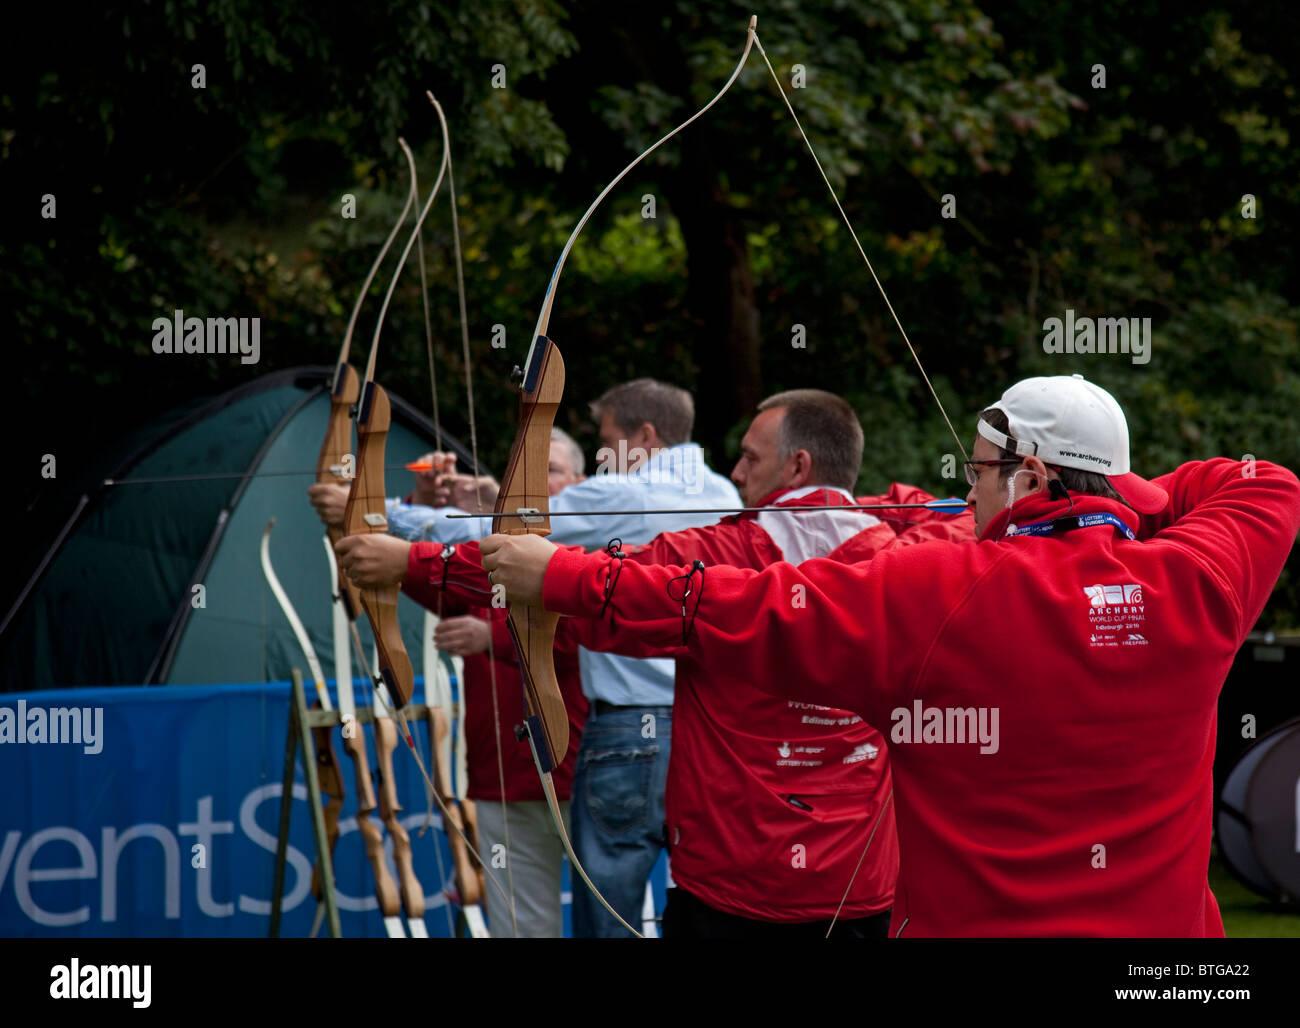 Males using bows and arrows firing at target, Edinburgh, Scotland UK, Europe - Stock Image